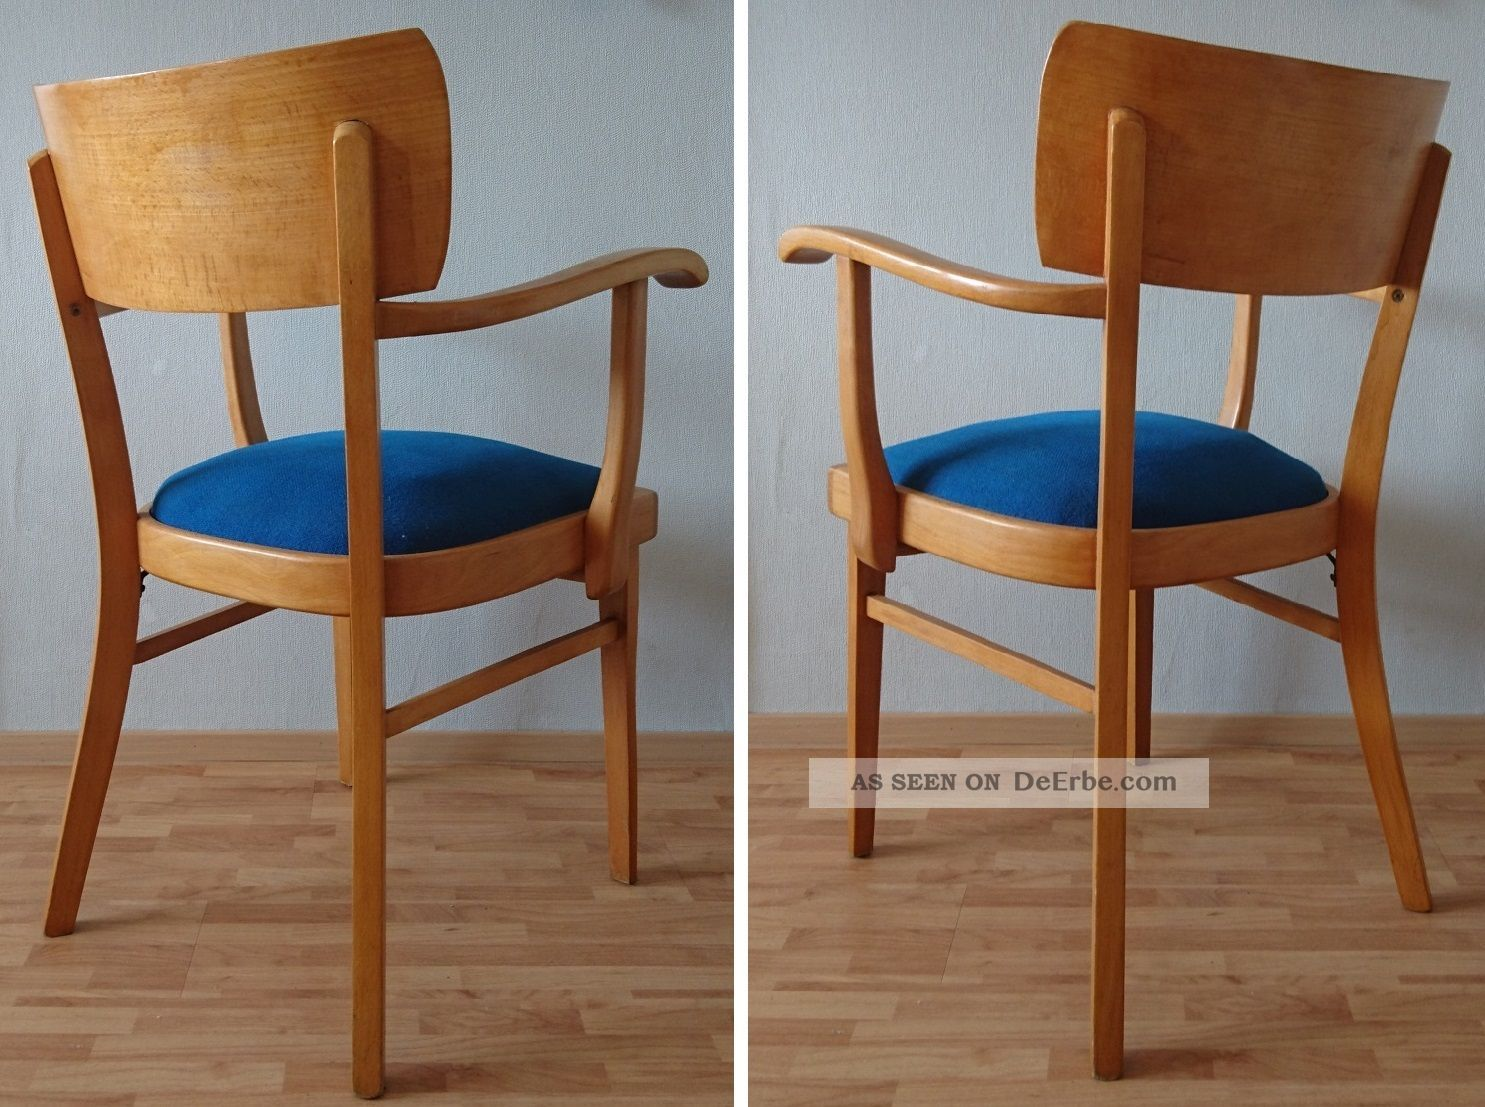 armlehnstuhl bauhaus art deco polster stuhl holzstuhl schreibtischstuhl loft top. Black Bedroom Furniture Sets. Home Design Ideas